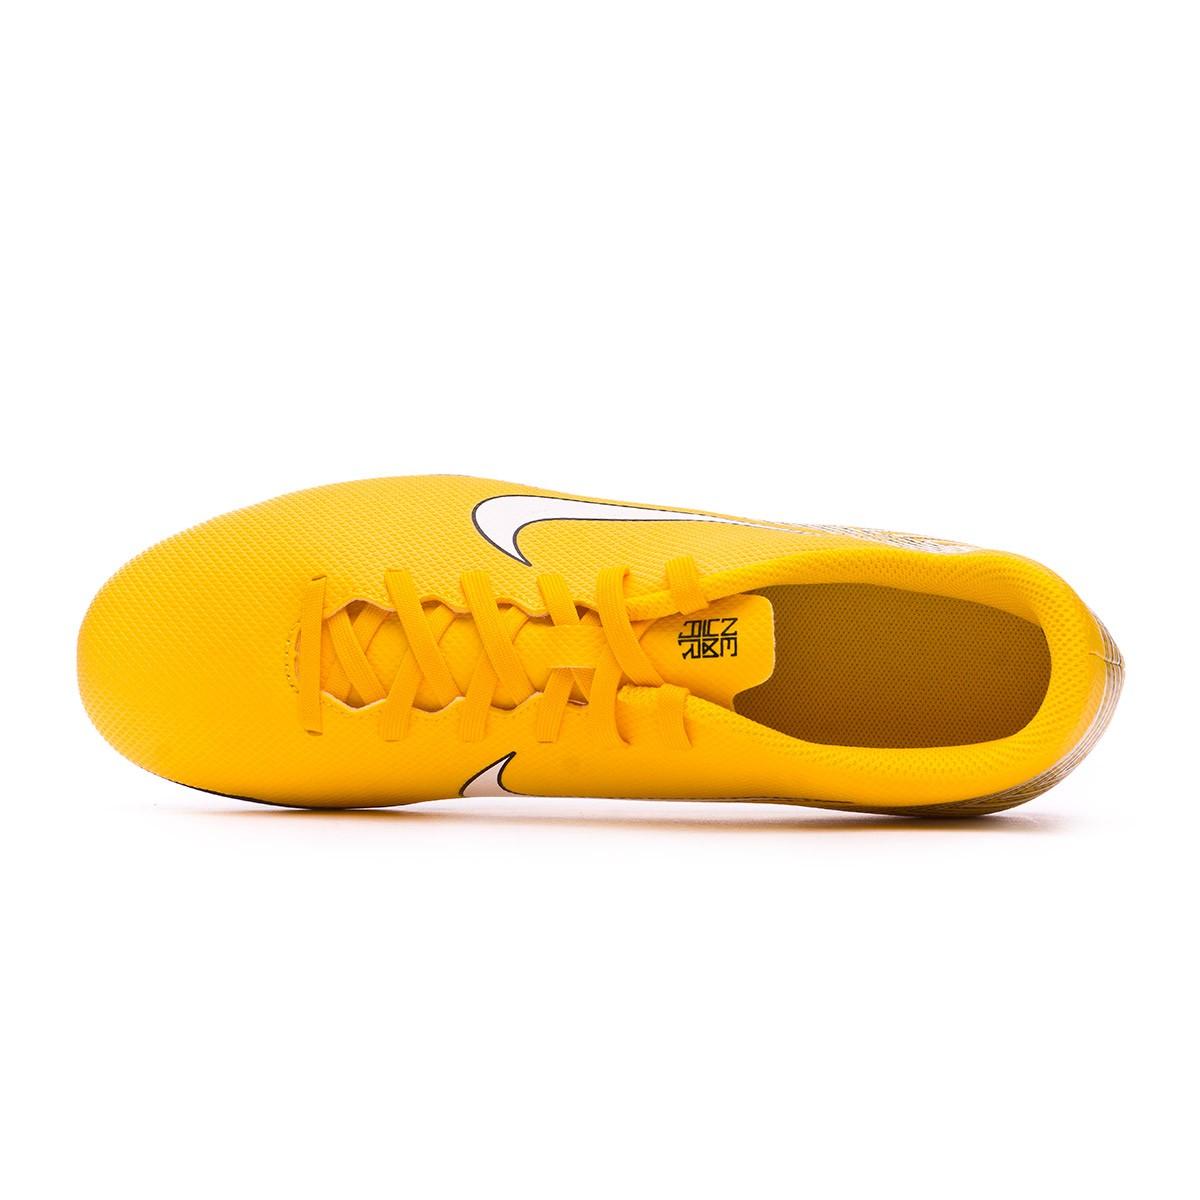 innovative design b5ebd 47053 Football Boots Nike Mercurial Vapor XII Club MG Neymar Yellow-Black -  Tienda de fútbol Fútbol Emotion